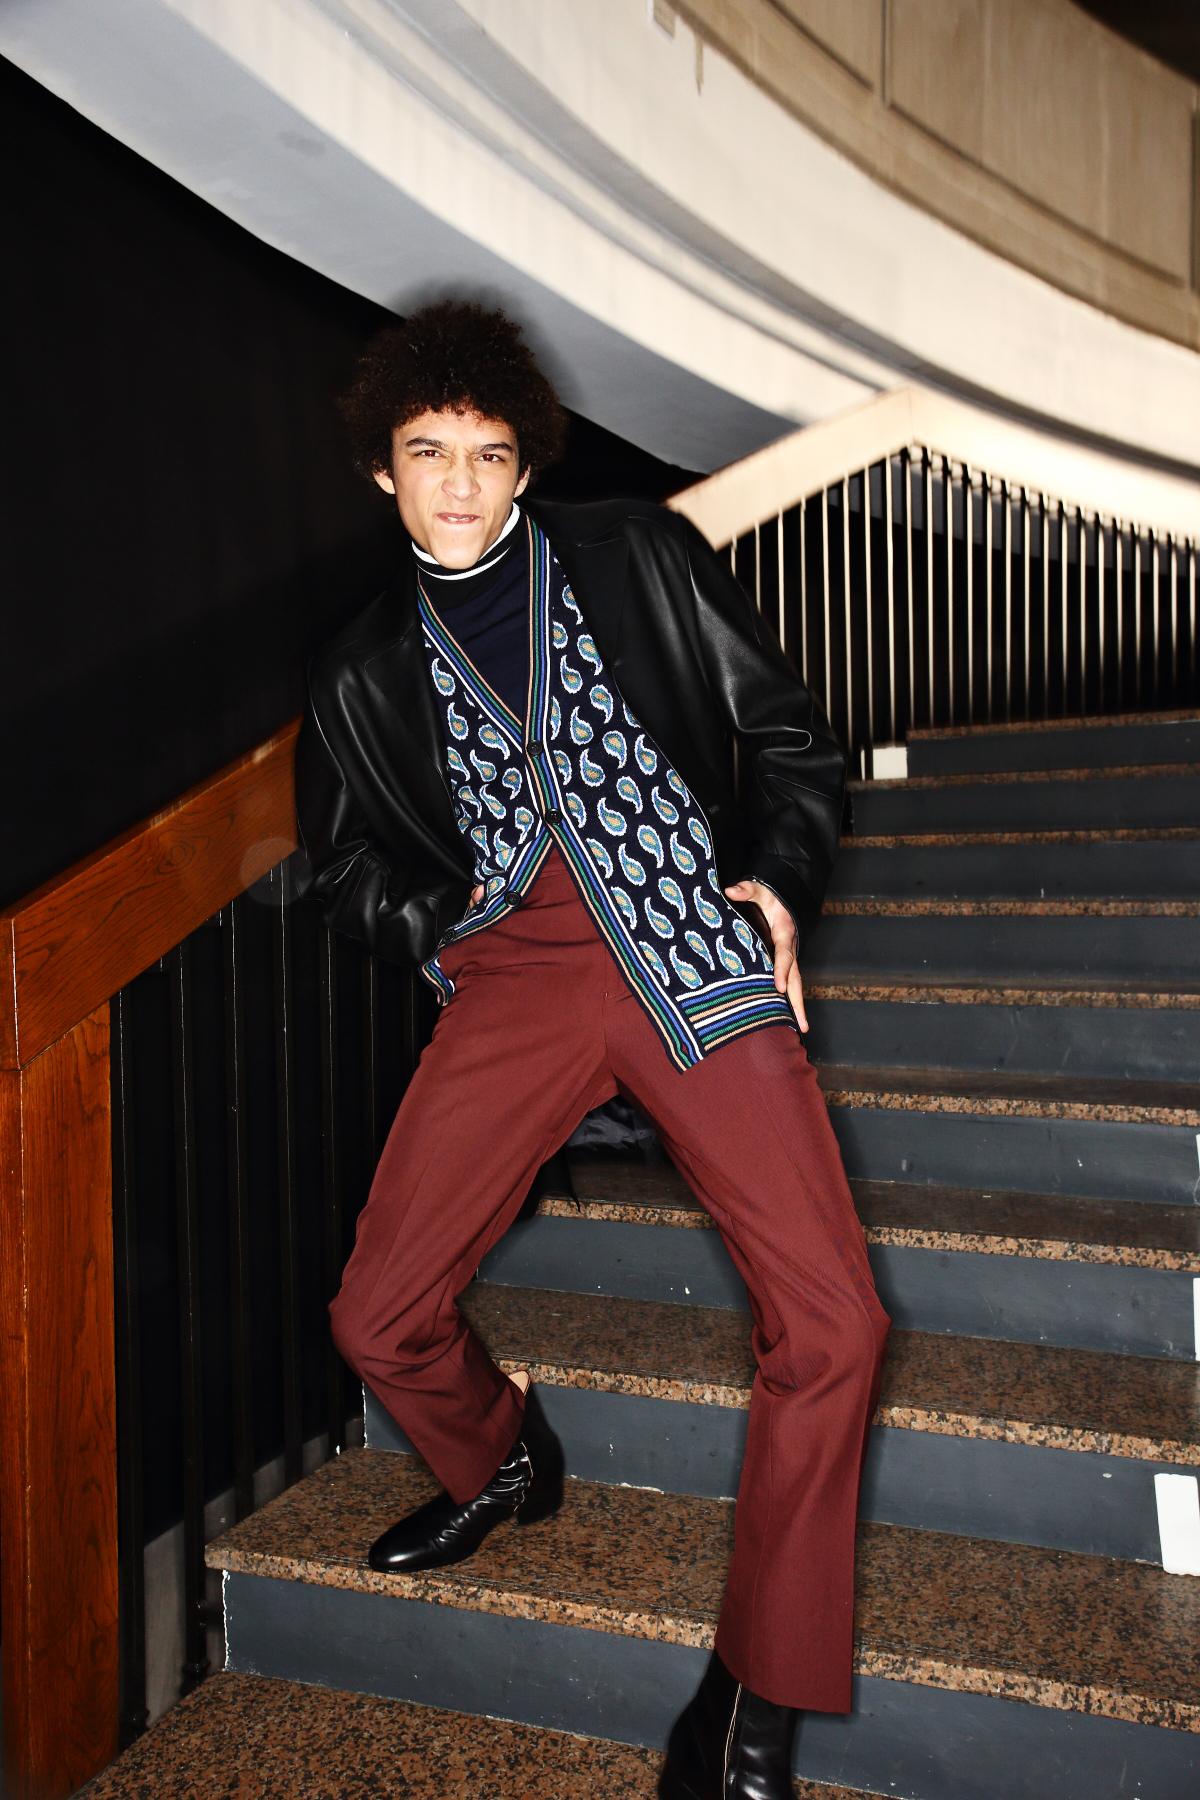 sonny vandevelde paul smith fall 16 men fashion show paris backstage. Black Bedroom Furniture Sets. Home Design Ideas